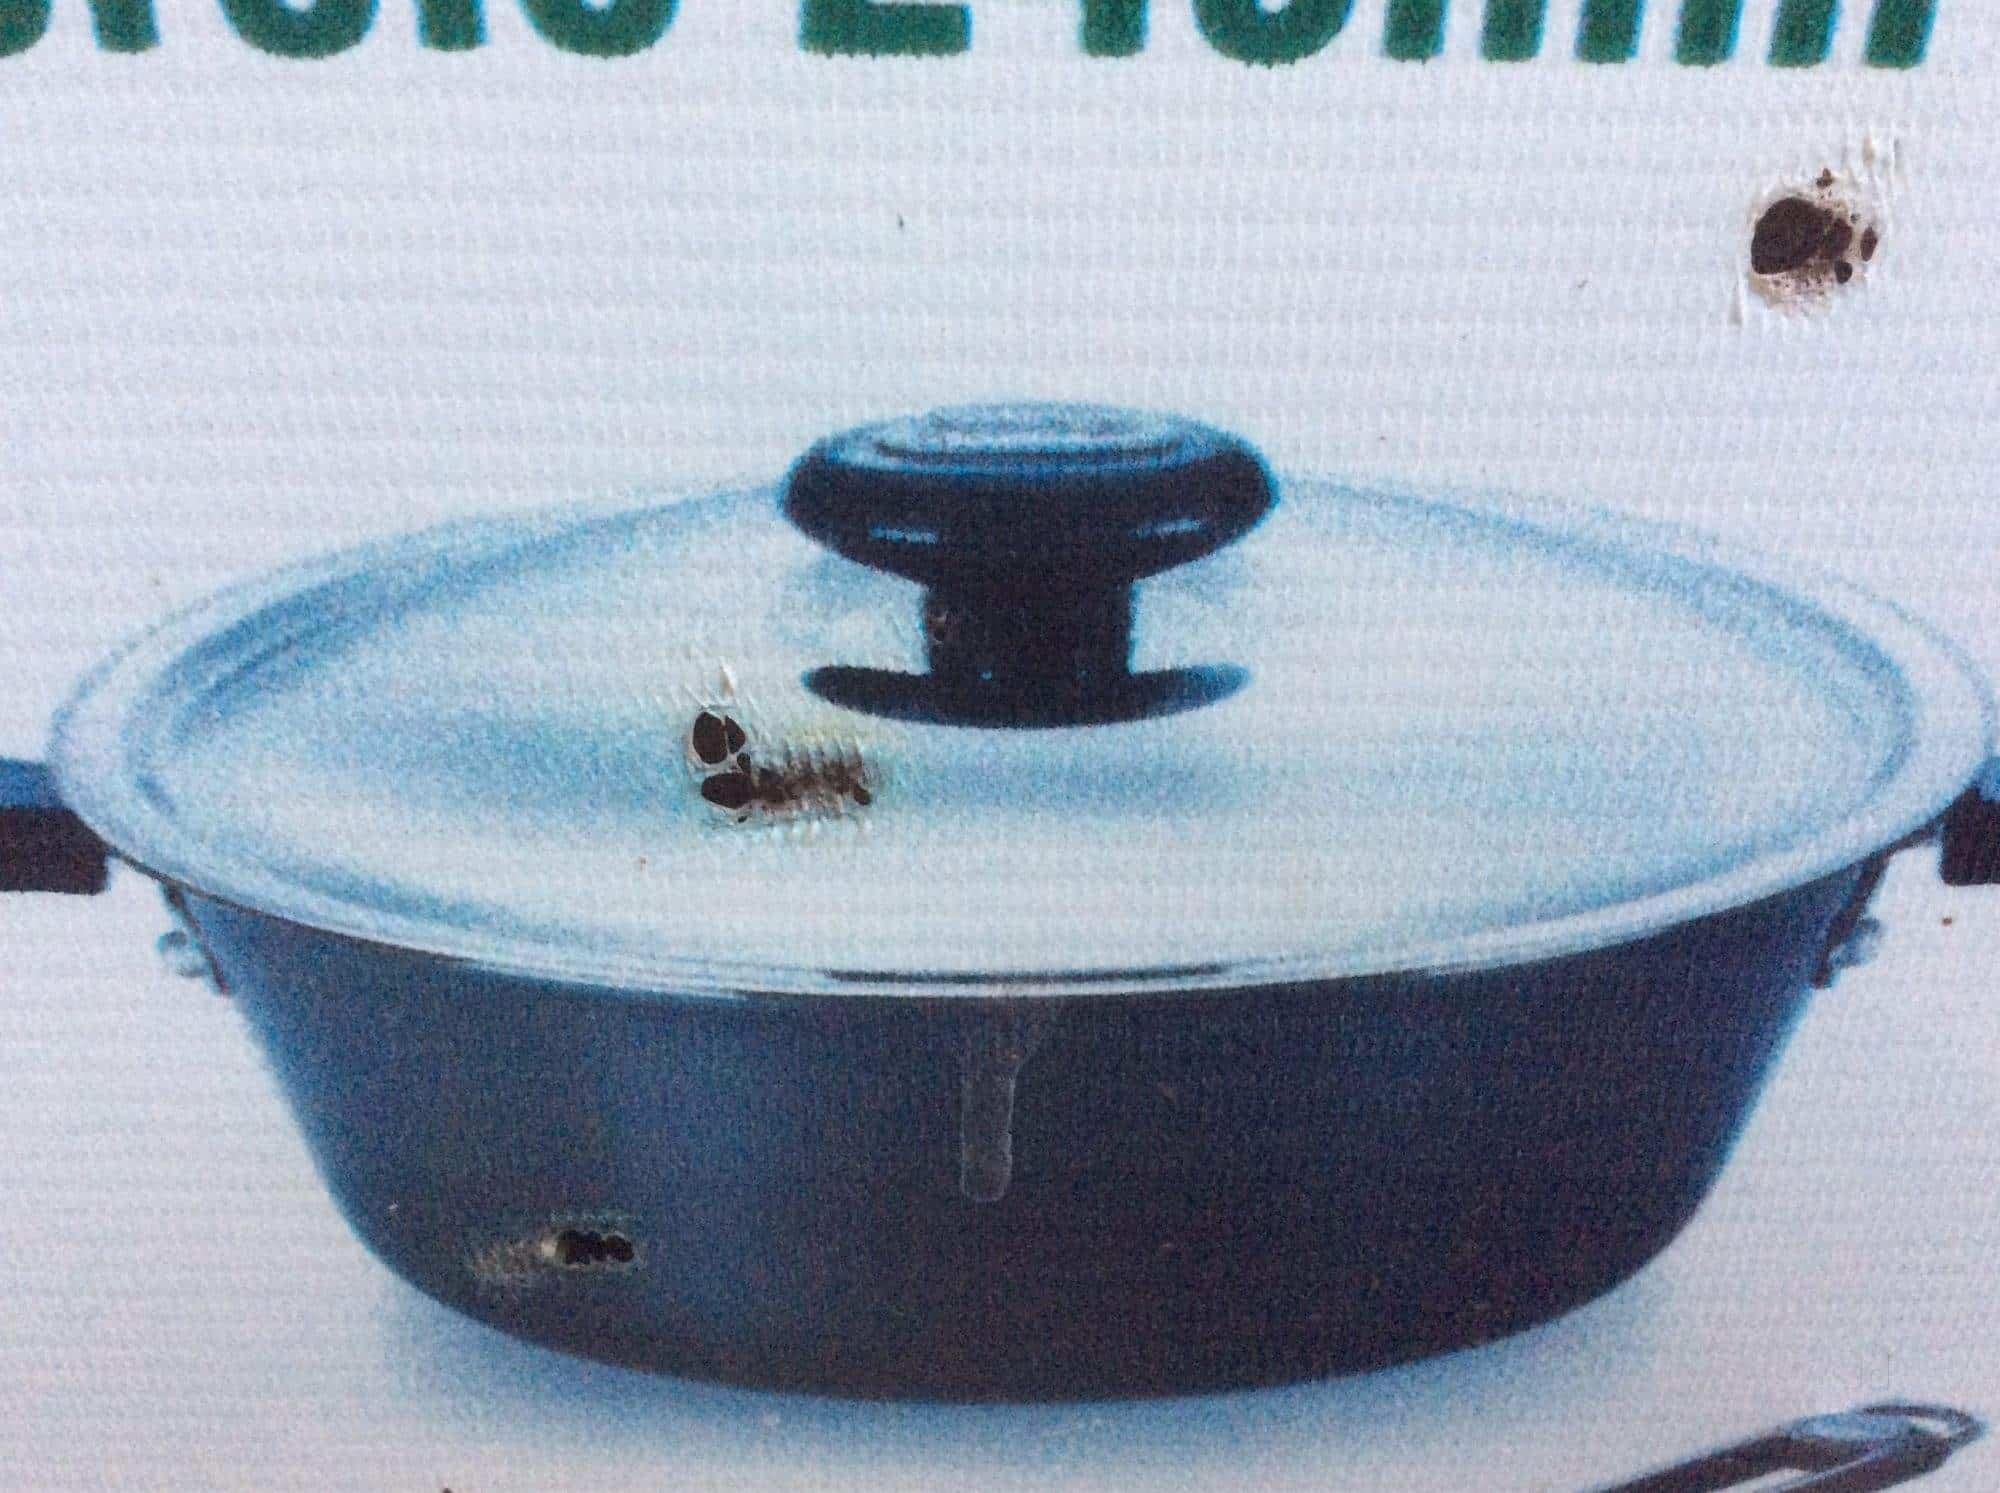 Prestige Smart Kitchen, Malleswaram - Home Appliance Dealers in ...